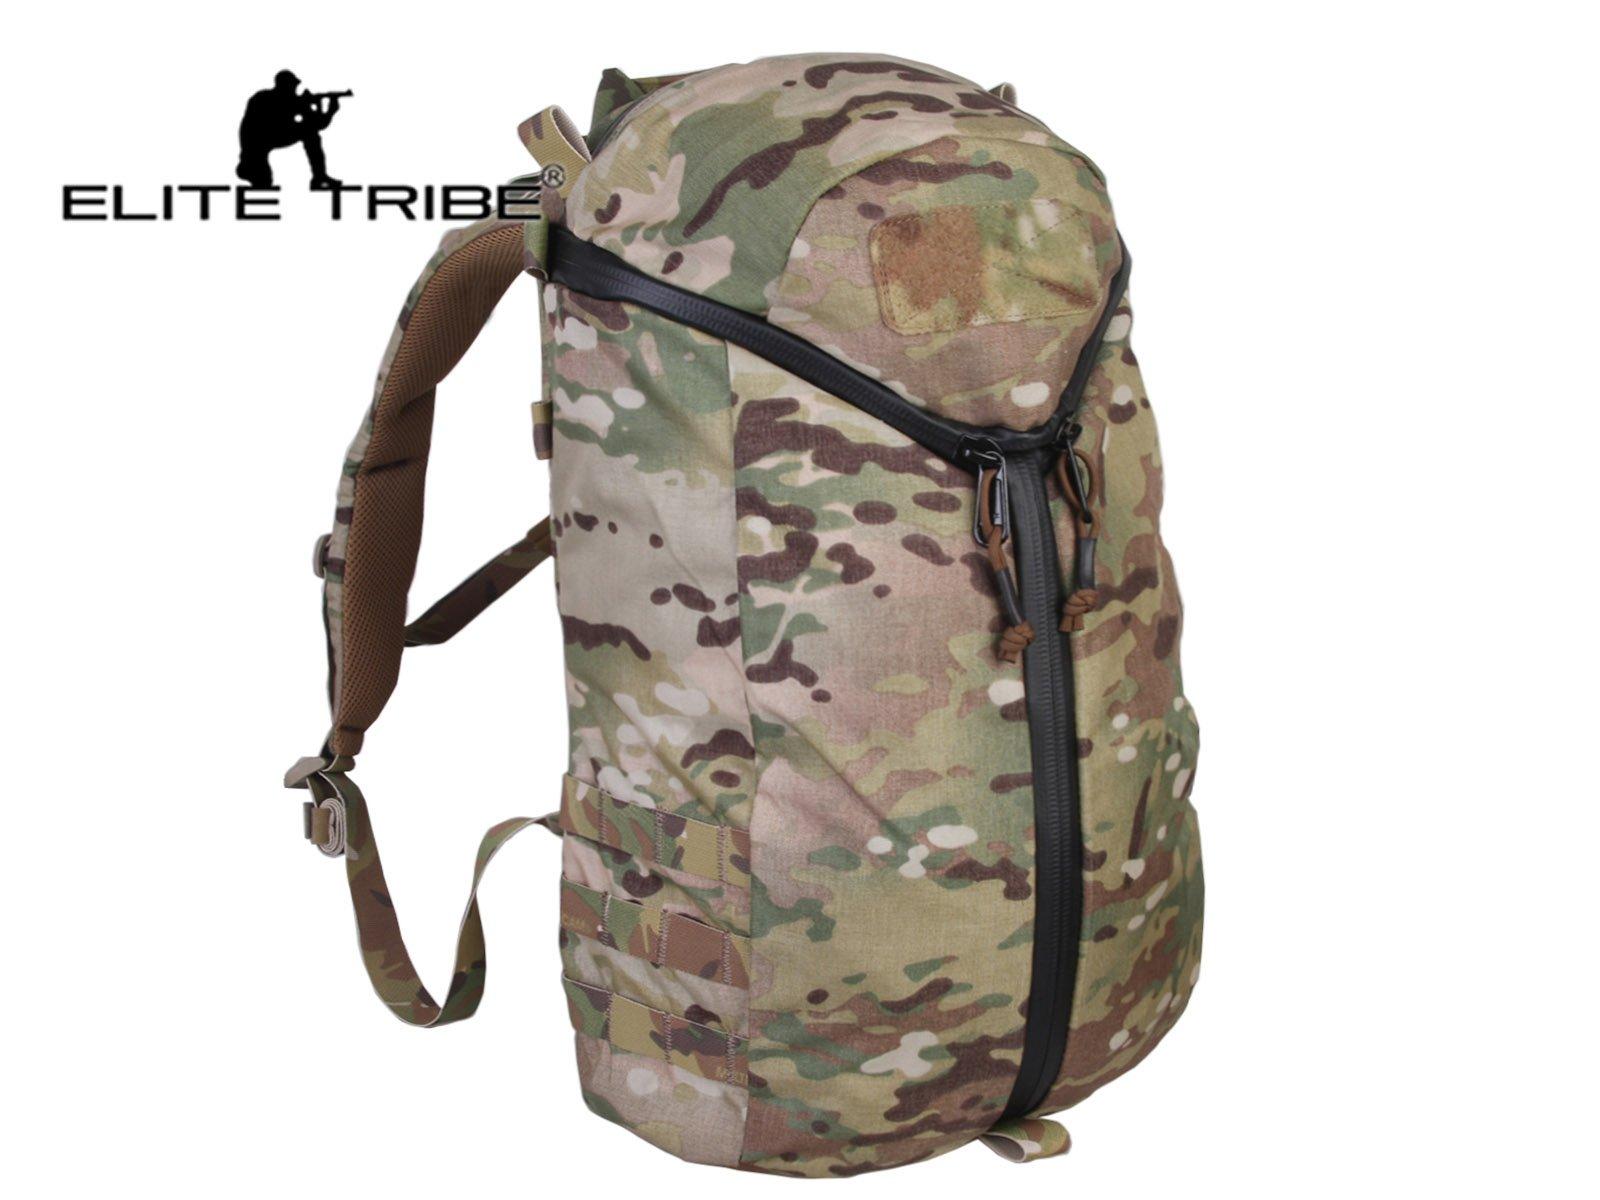 Elite Tribe Y Zip City Assault Pack Travelling Multi-Purpose Molle Shoulder Bag